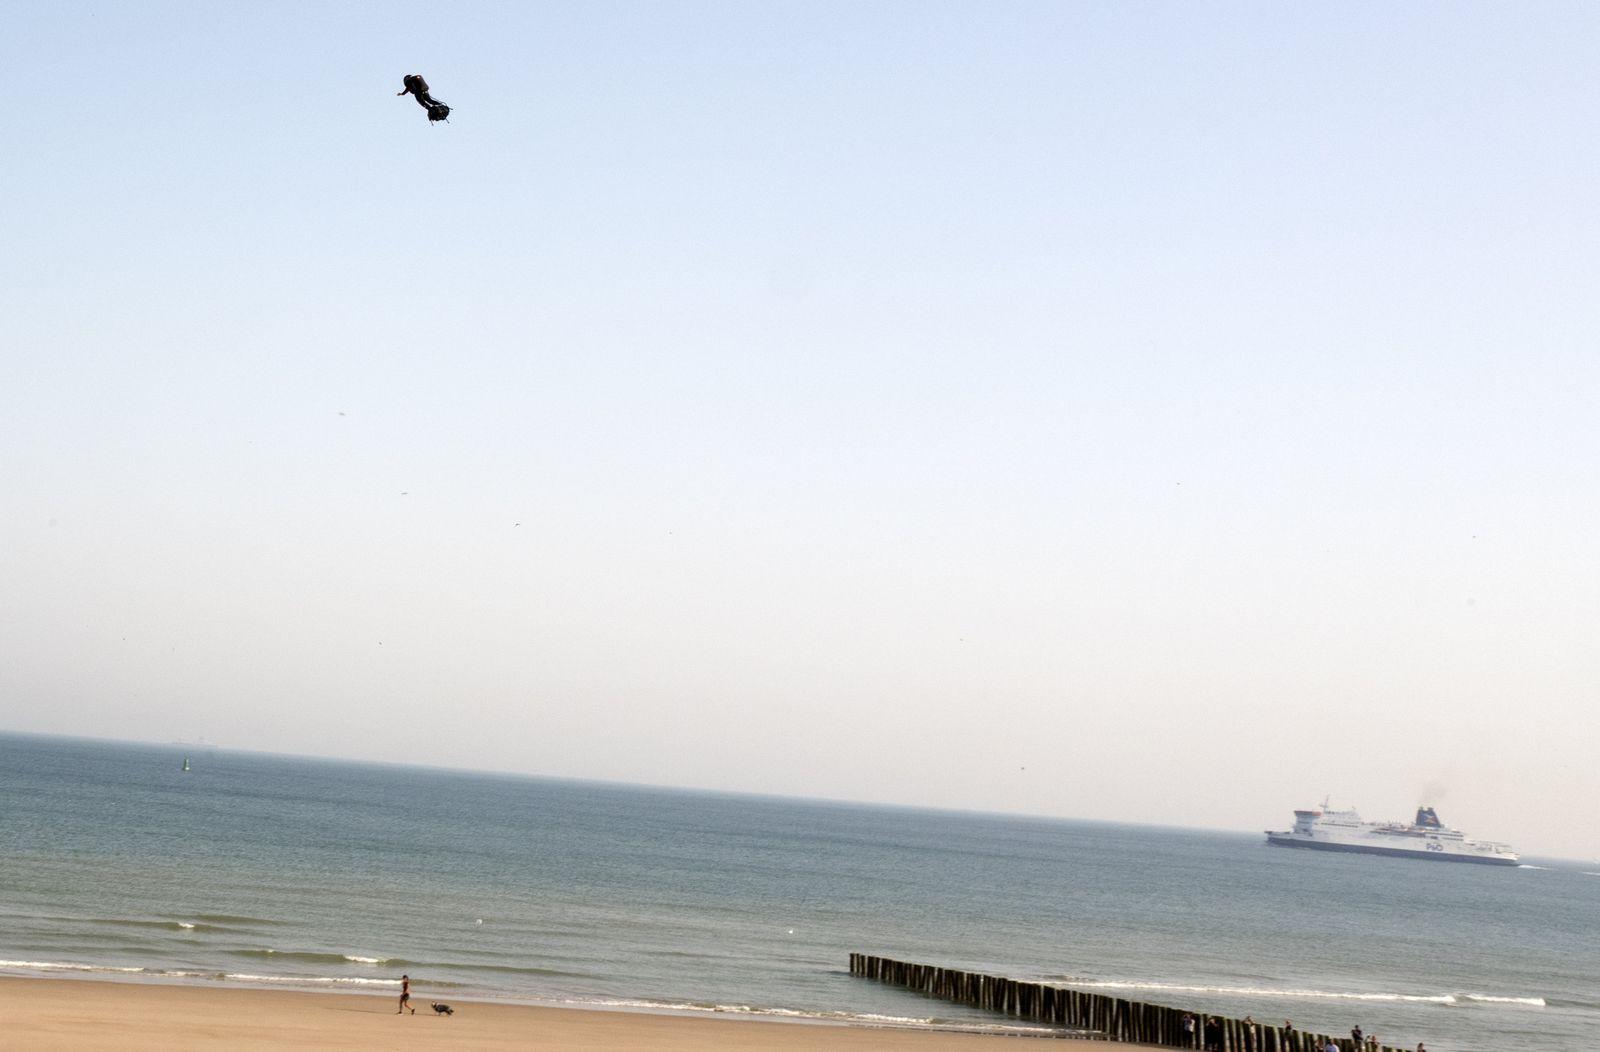 France Flying Man/ Zapata